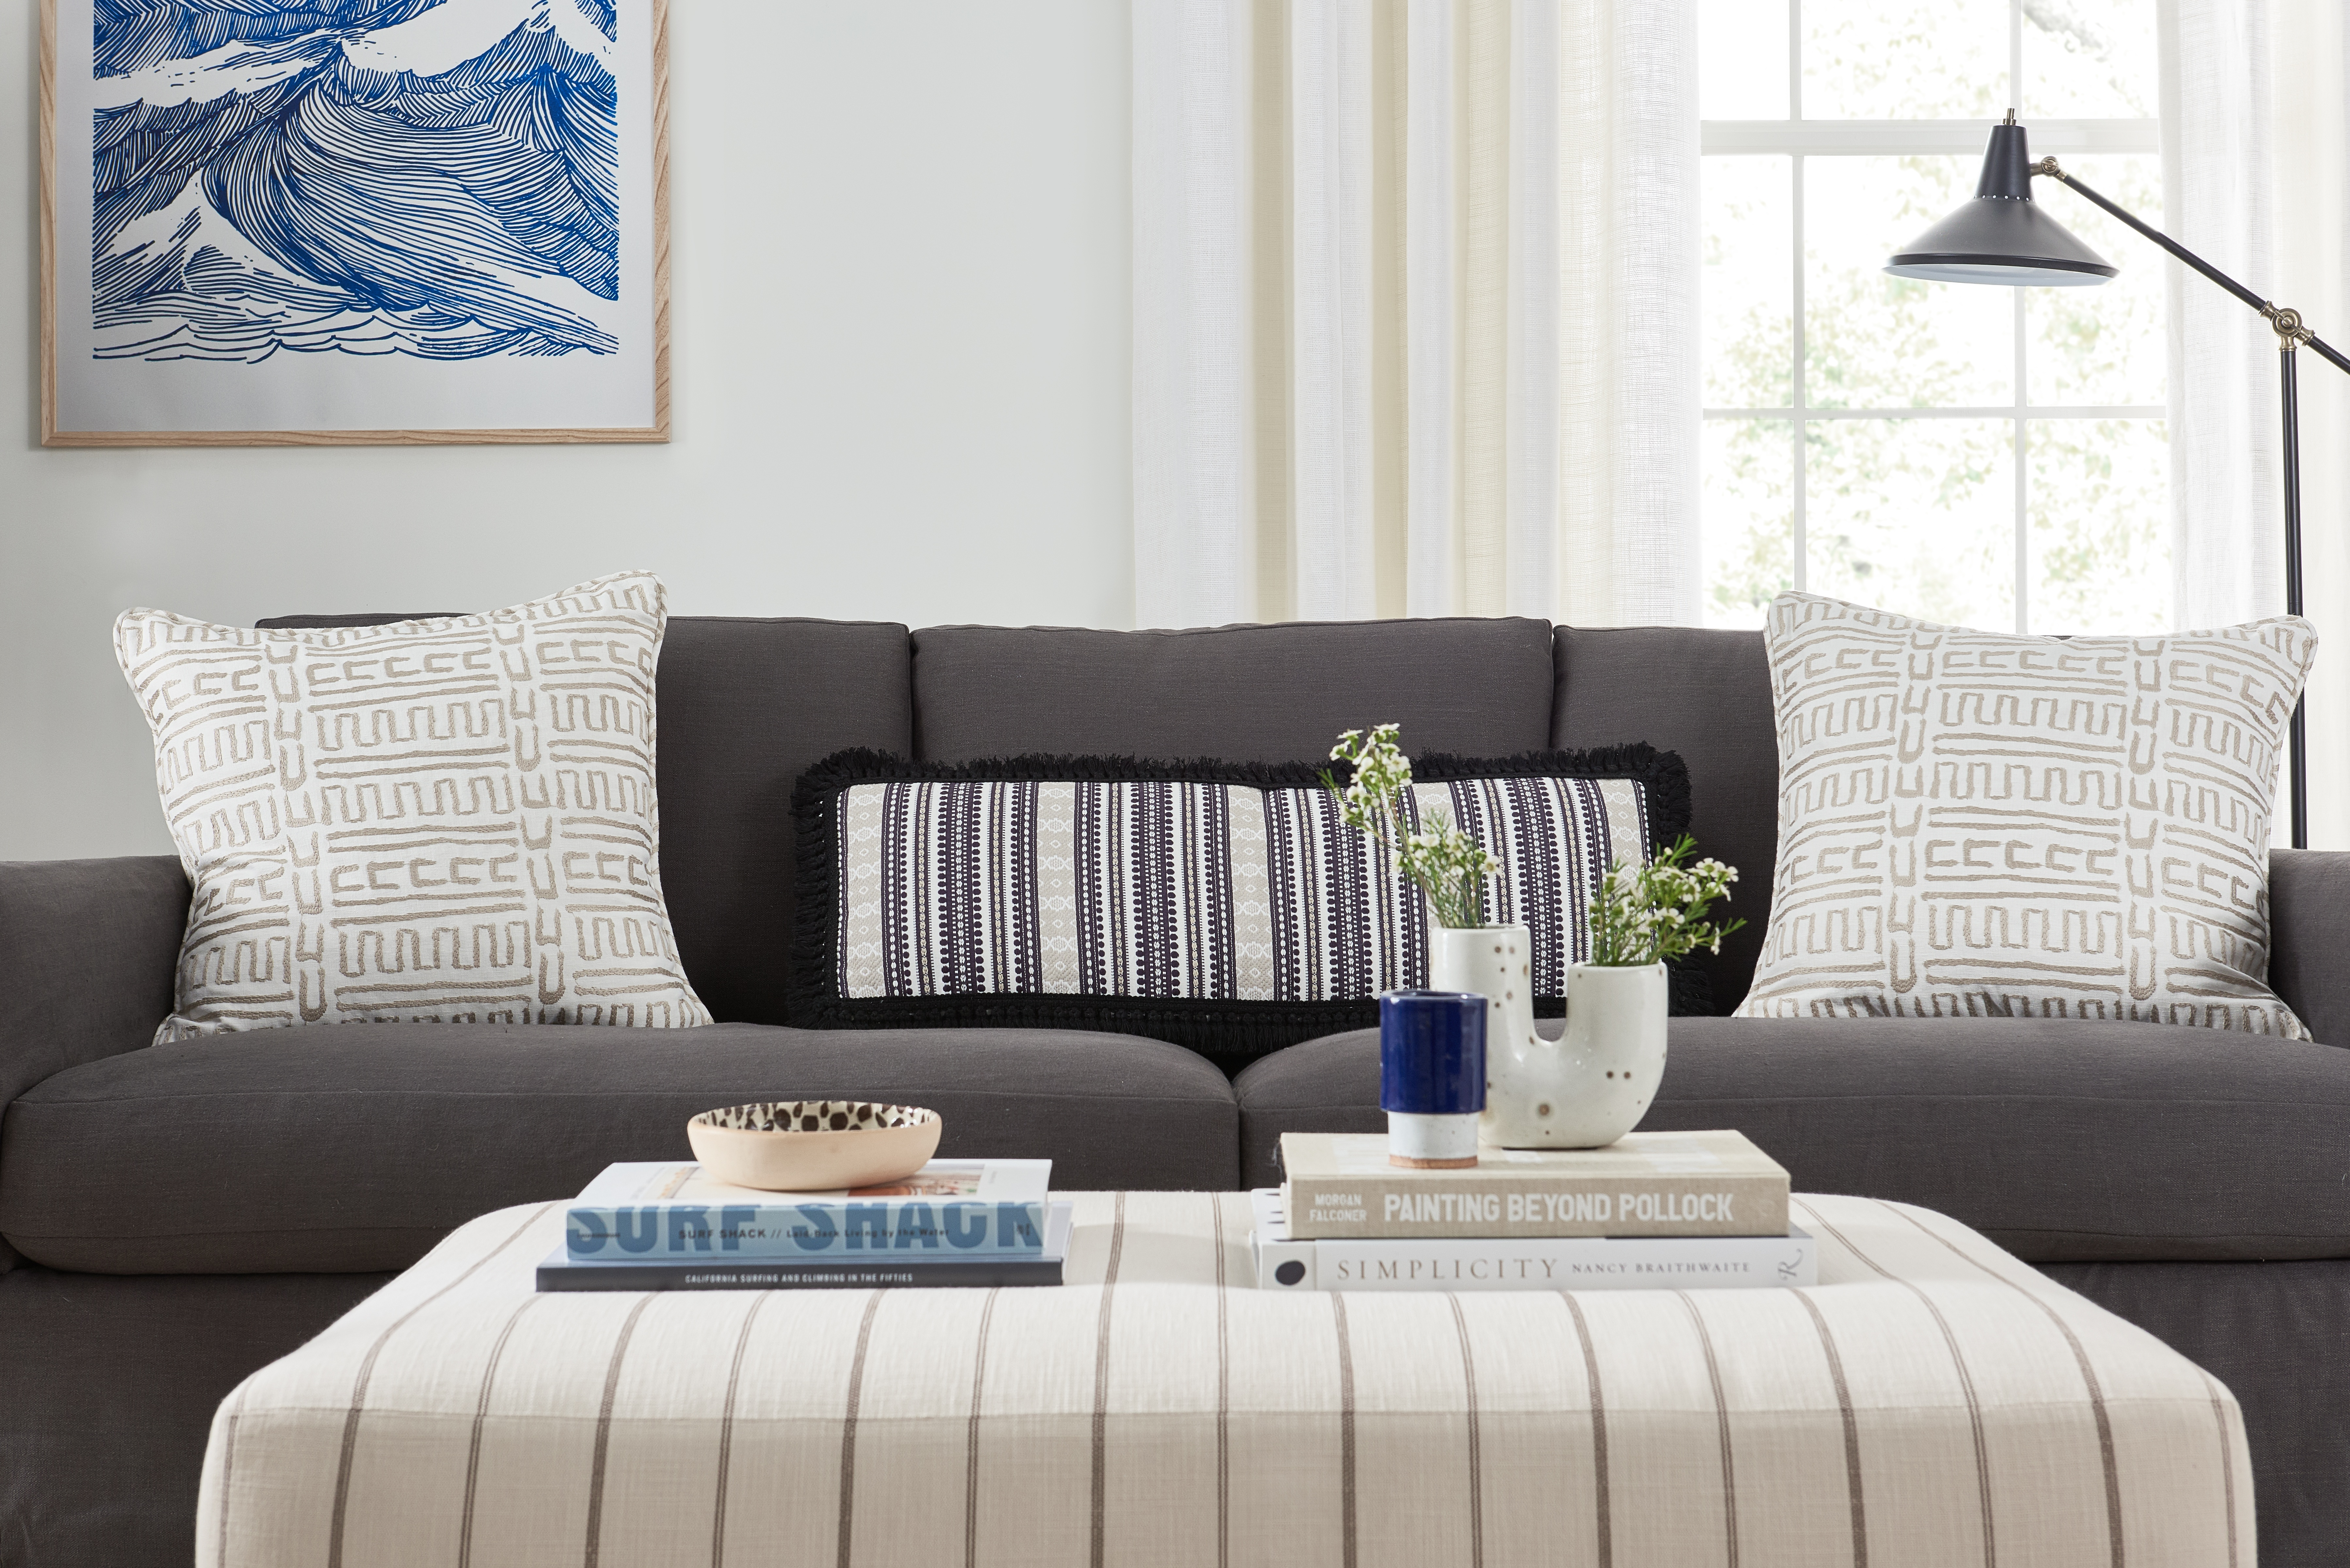 Modern bohemian living room, coastal chic interior design, black and white bohemian